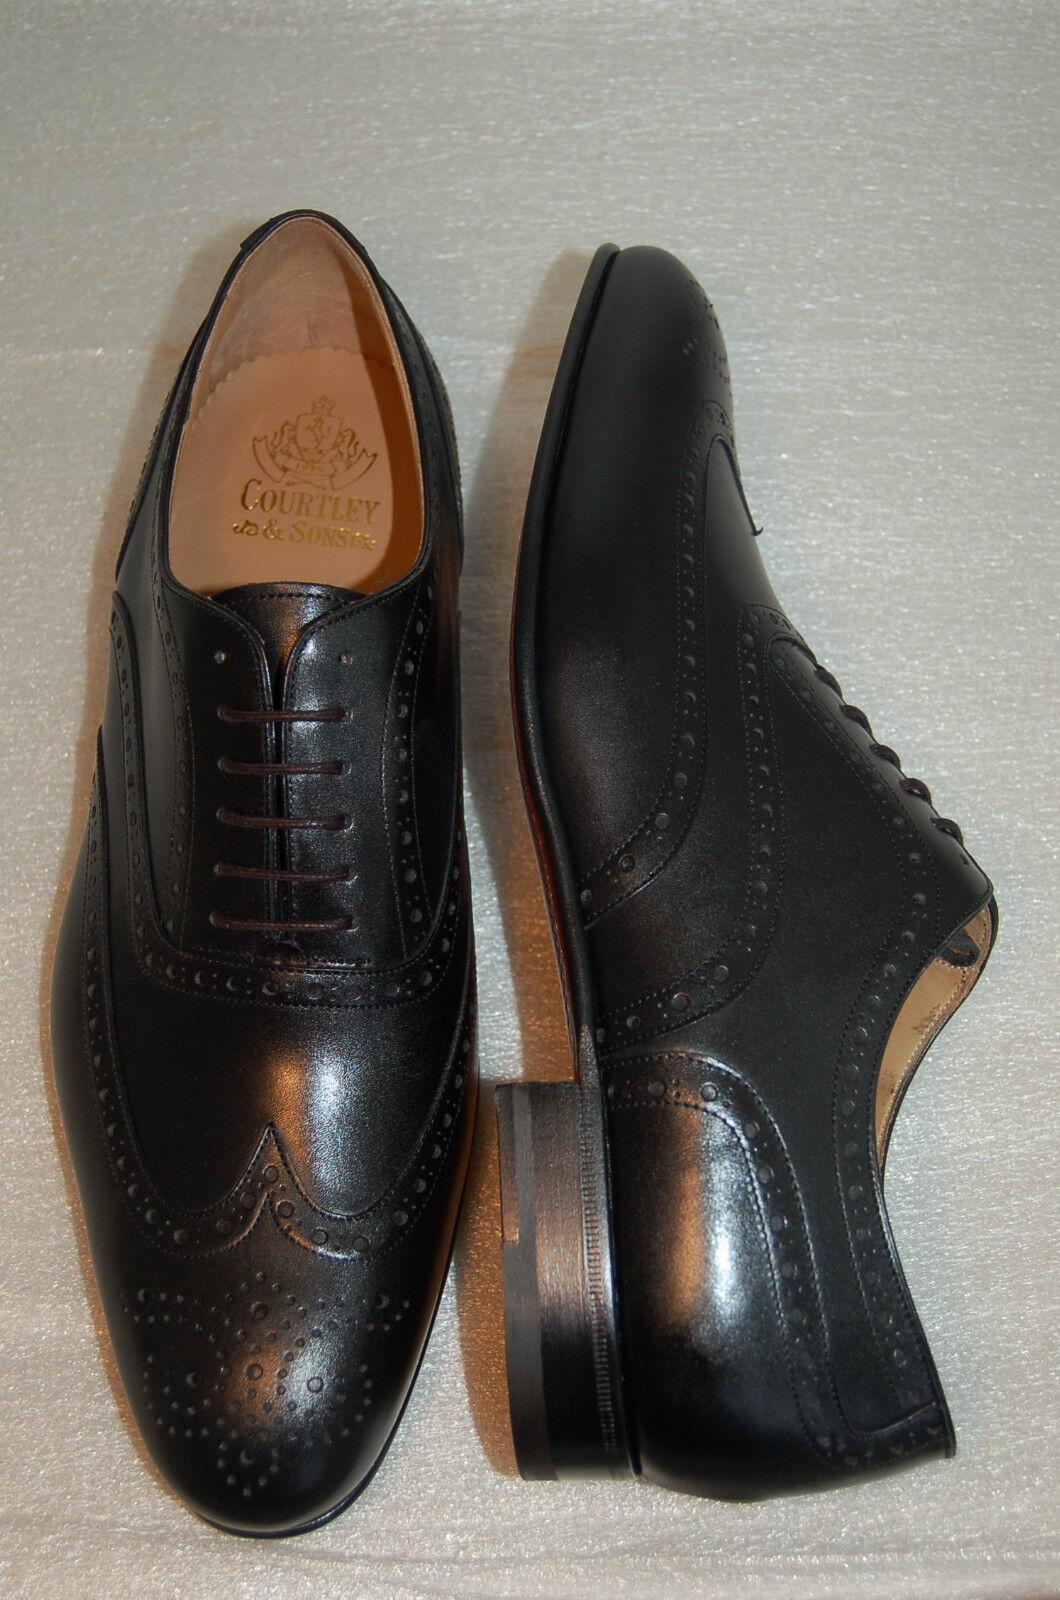 MAN - OXFORD WINGTIP - BLACK CALF CALF CALF W/PERFS AND MEDALLION - LEATHER SOLE - BLAKE 2618d4